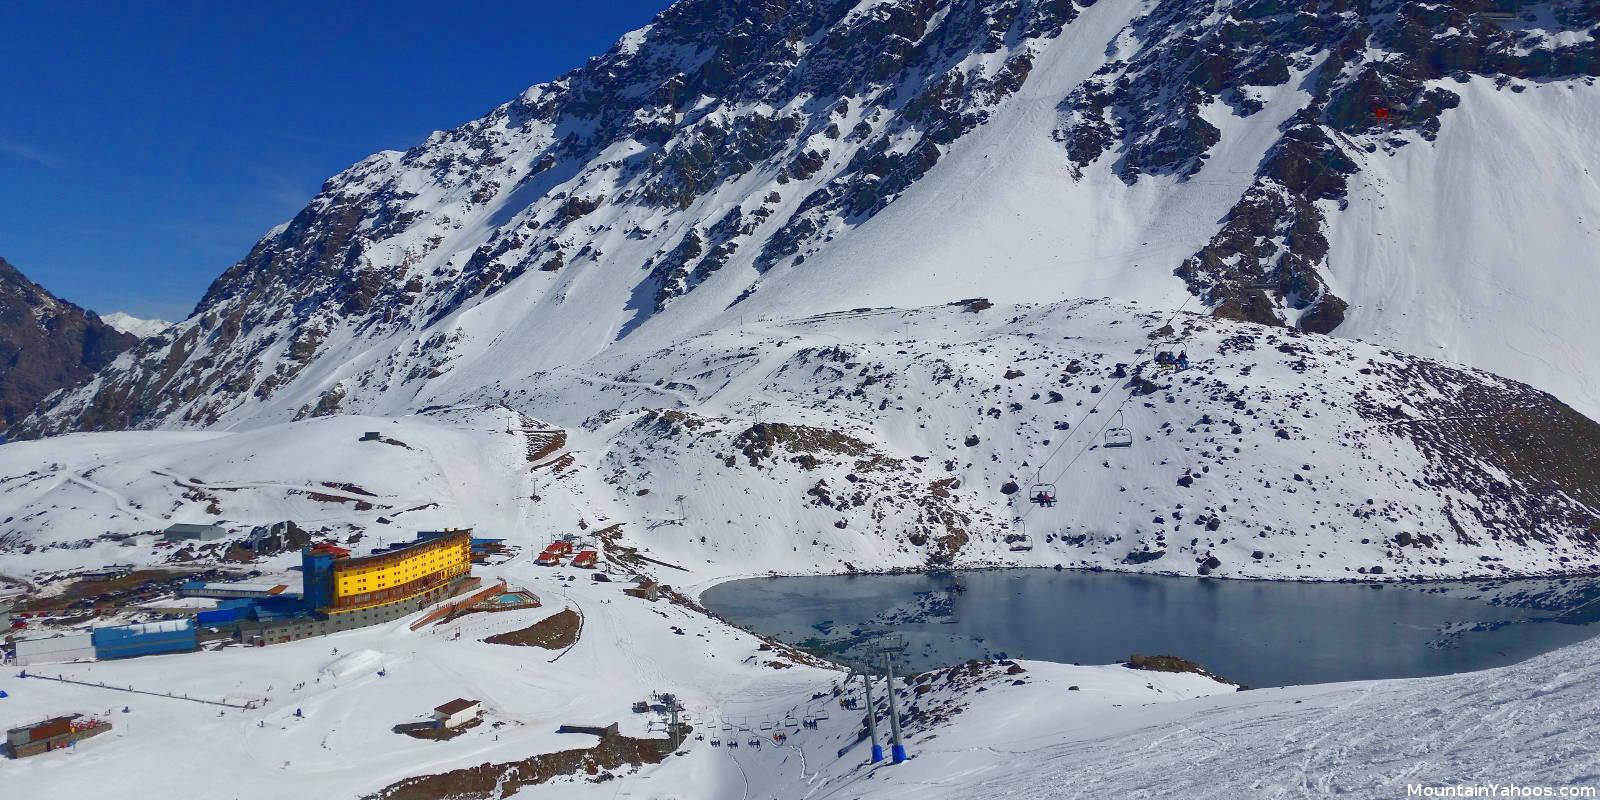 d620a7a22c0f Portillo (Chile) Ski Resort Review and Guide